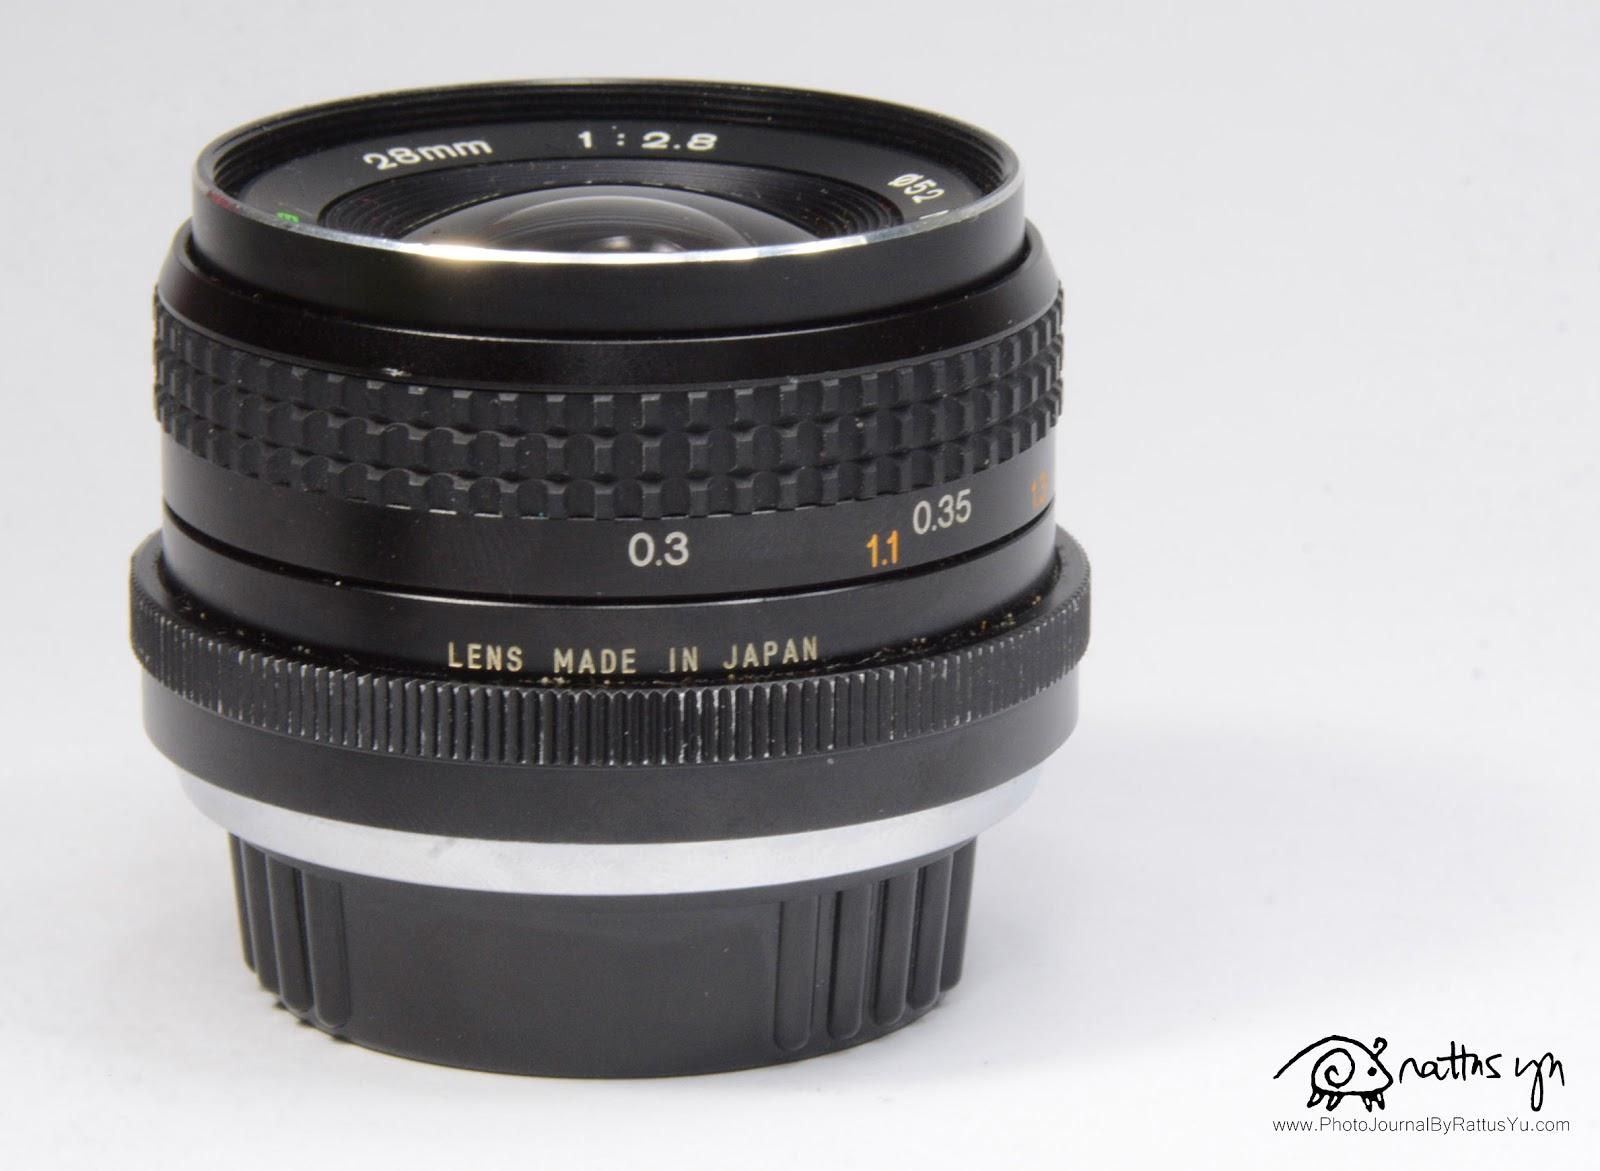 Tokina RMC 28mm f/2.8